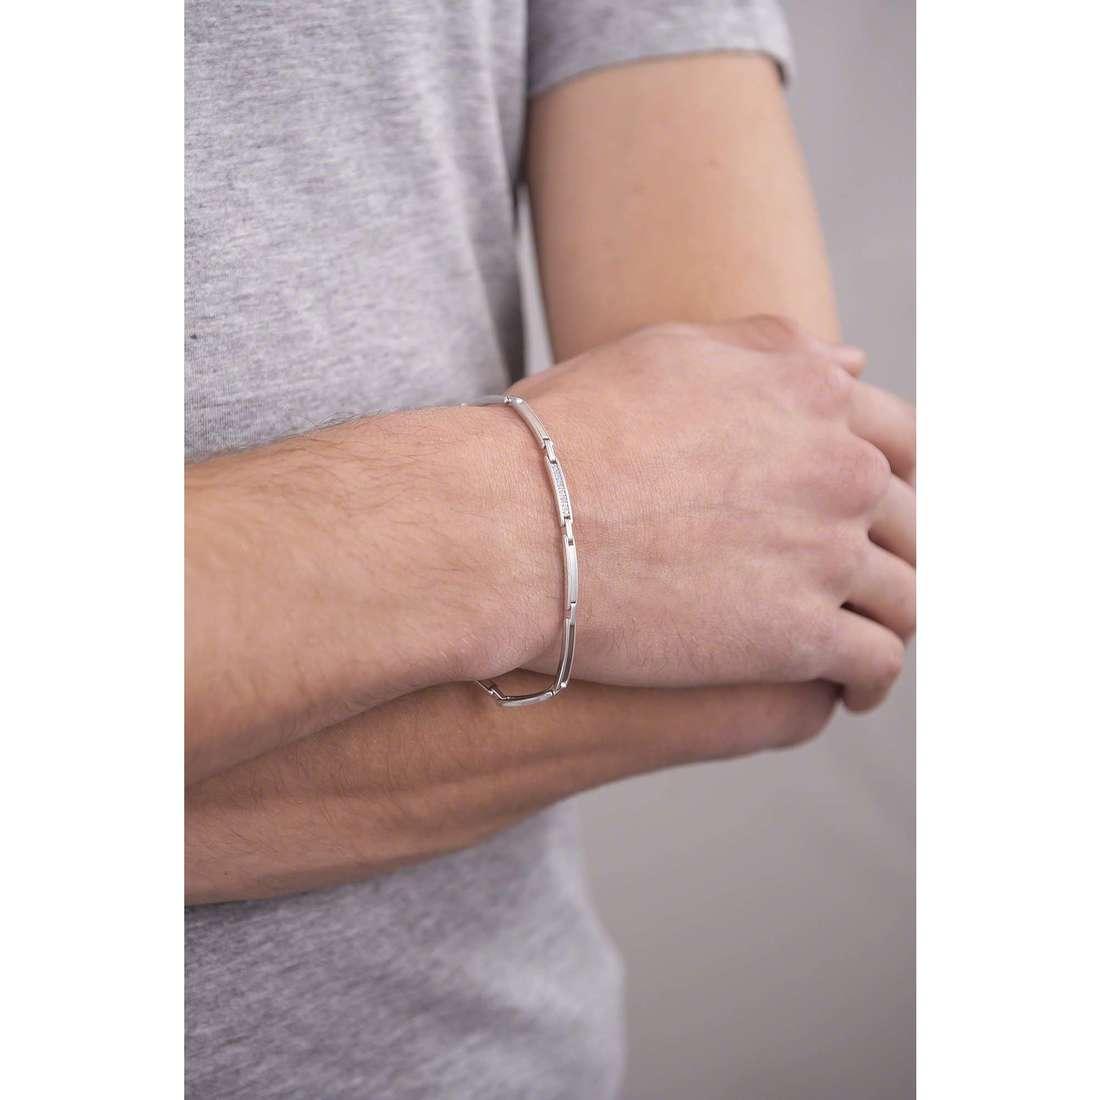 Comete bracelets Business man UBR 740 photo wearing